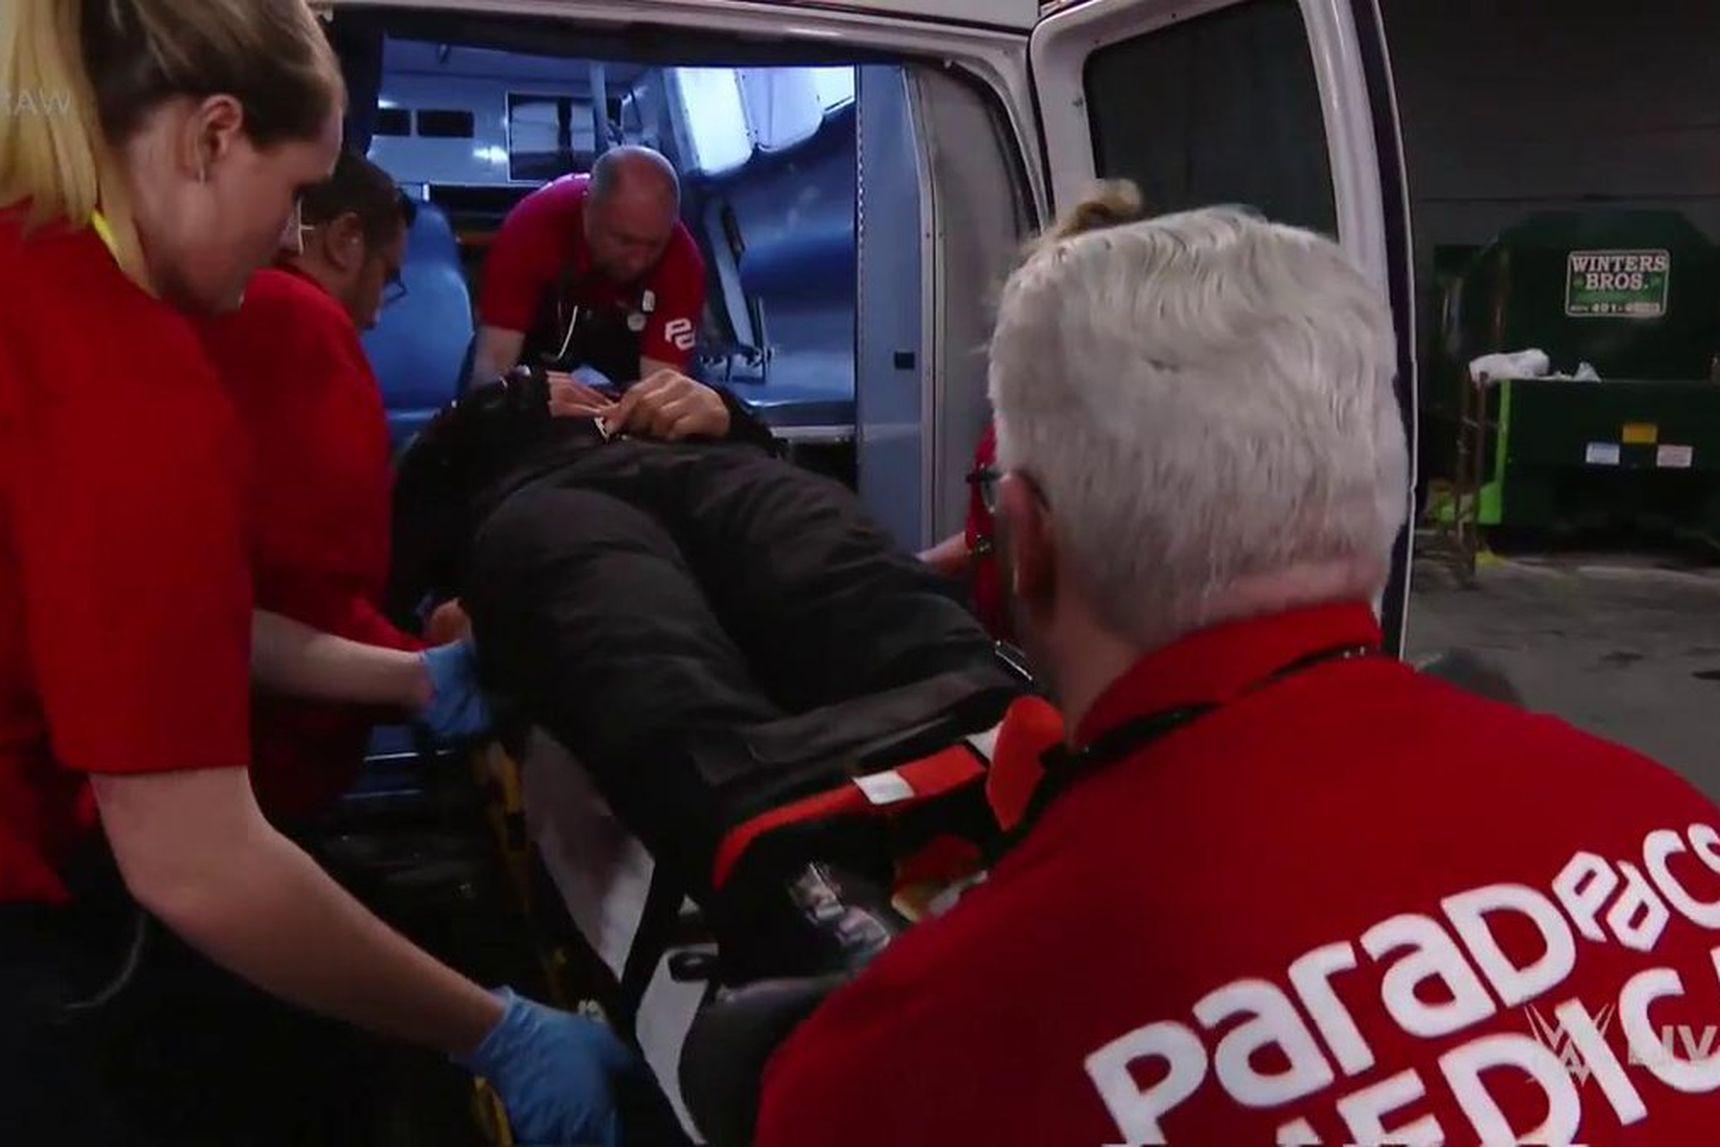 ParaDocs crew loads injured WWE Superstar Roman Reigns into an ambulance.